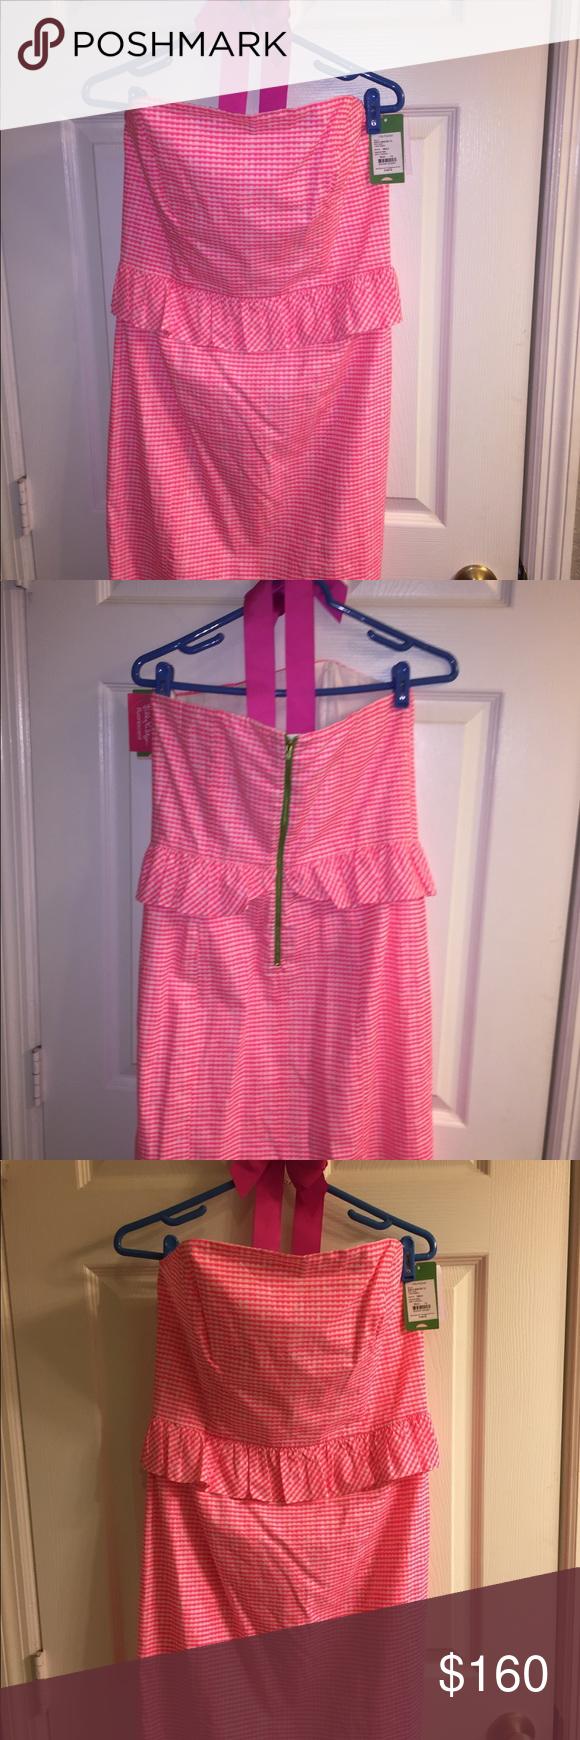 Lilly Pulitzer Lowe Peplum Dress, size 12